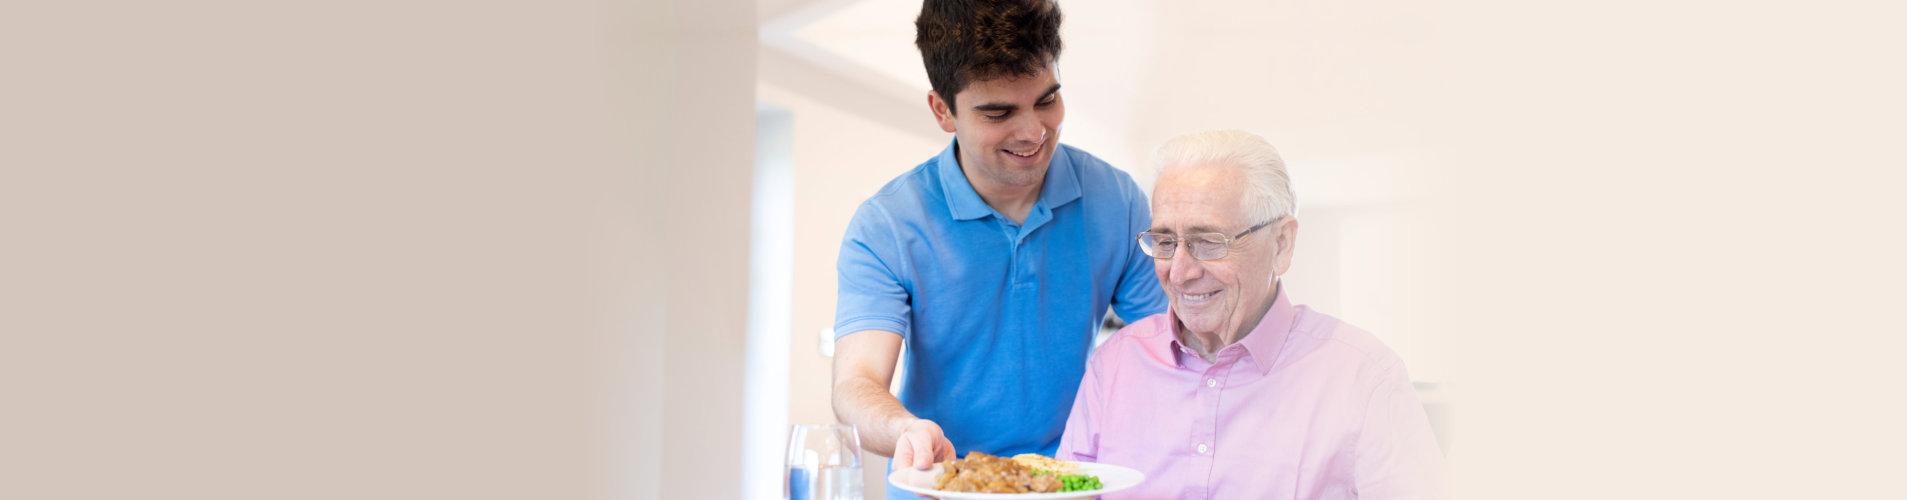 male caregiver serving meal to senior man